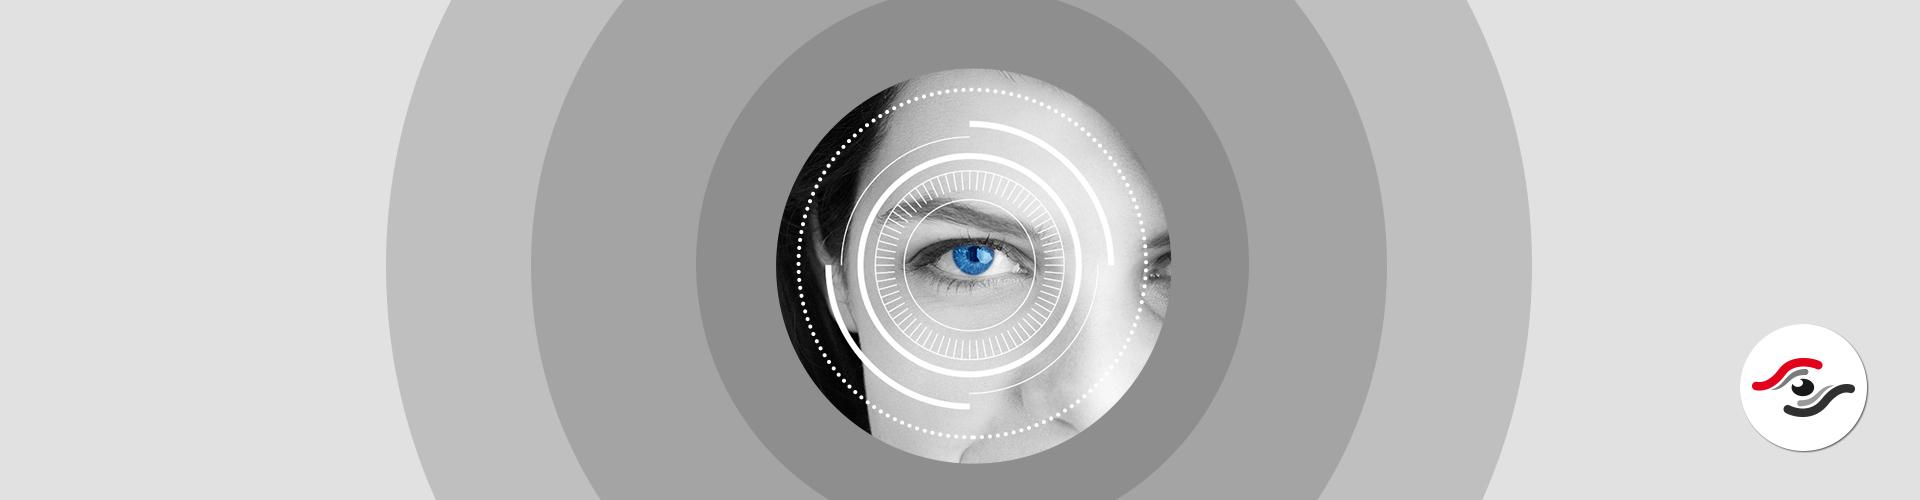 Dry Eye Syndrome, Its Diagnosis & Treatment